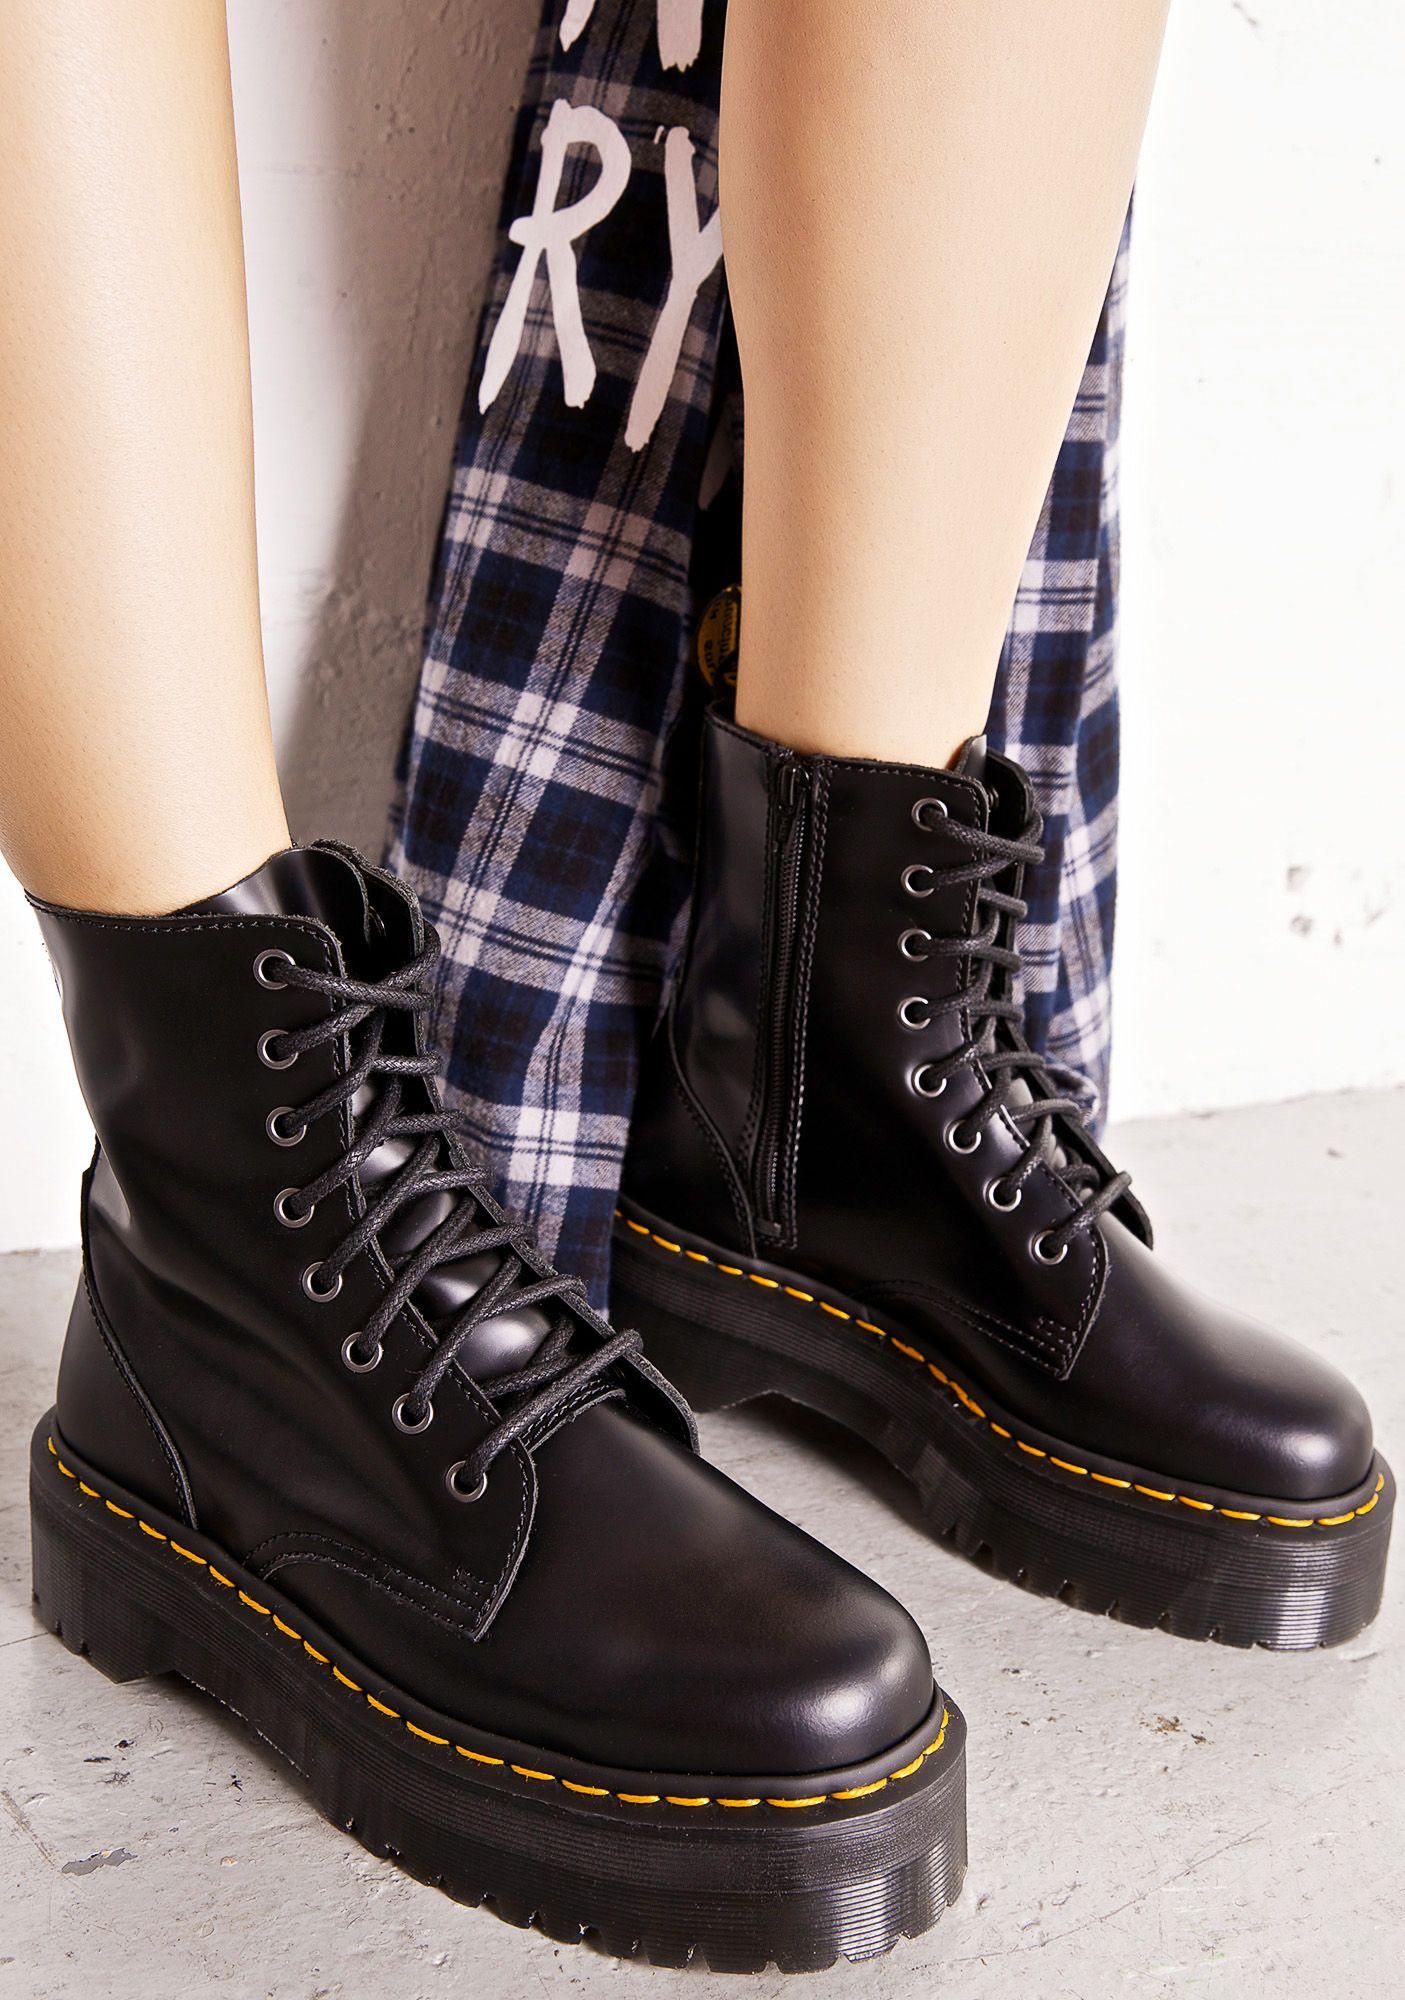 a64b4b5e Shoes & Boots | Shoes | Zapatos grunge, Zapatos y Zapatos negros